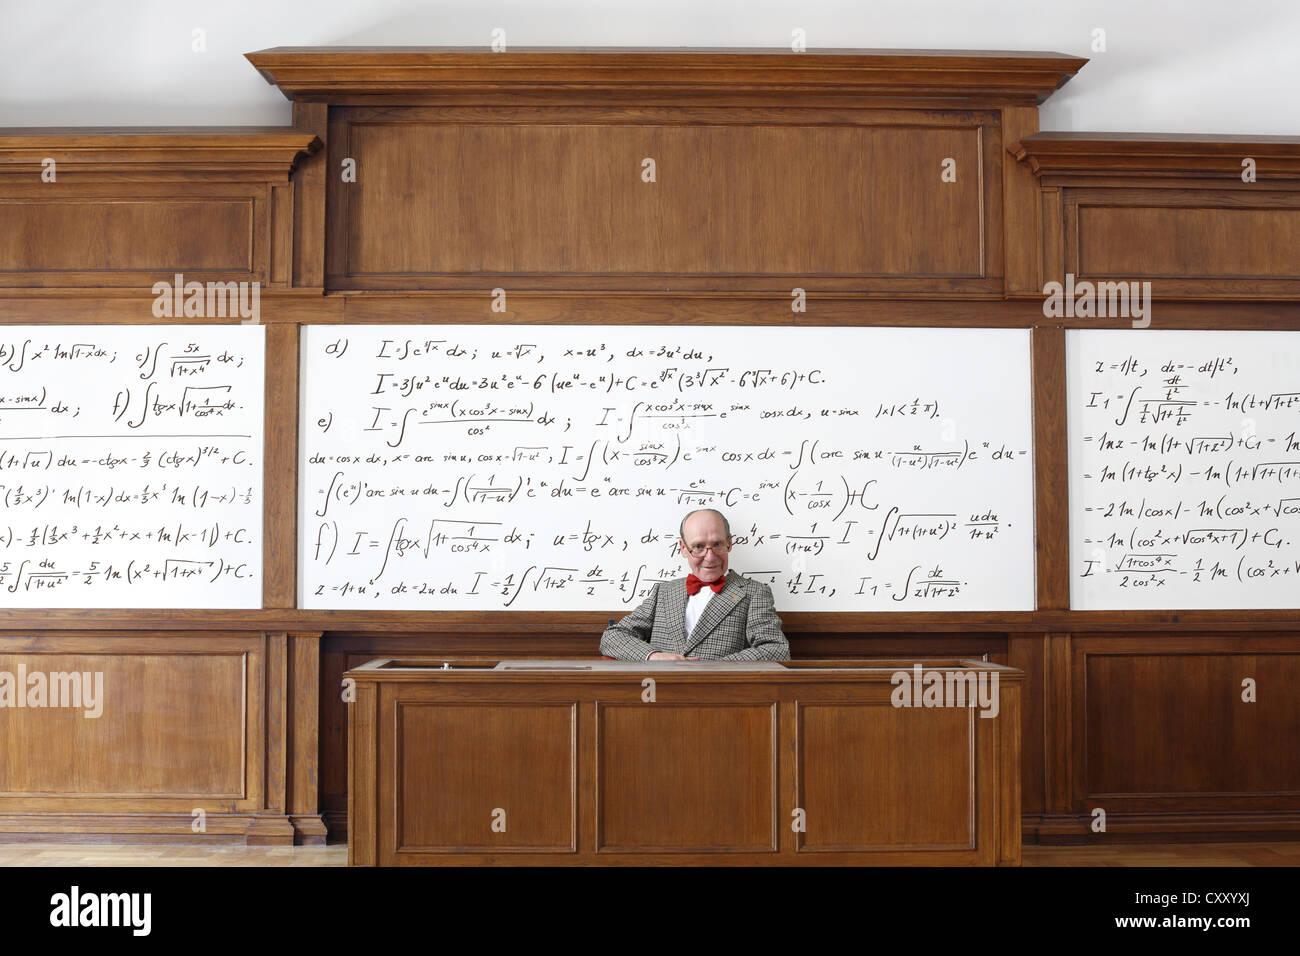 Professor, teacher, blackboard, mathematic formulas, equations, mathematic lessons, maths, lecture theatre, university - Stock Image